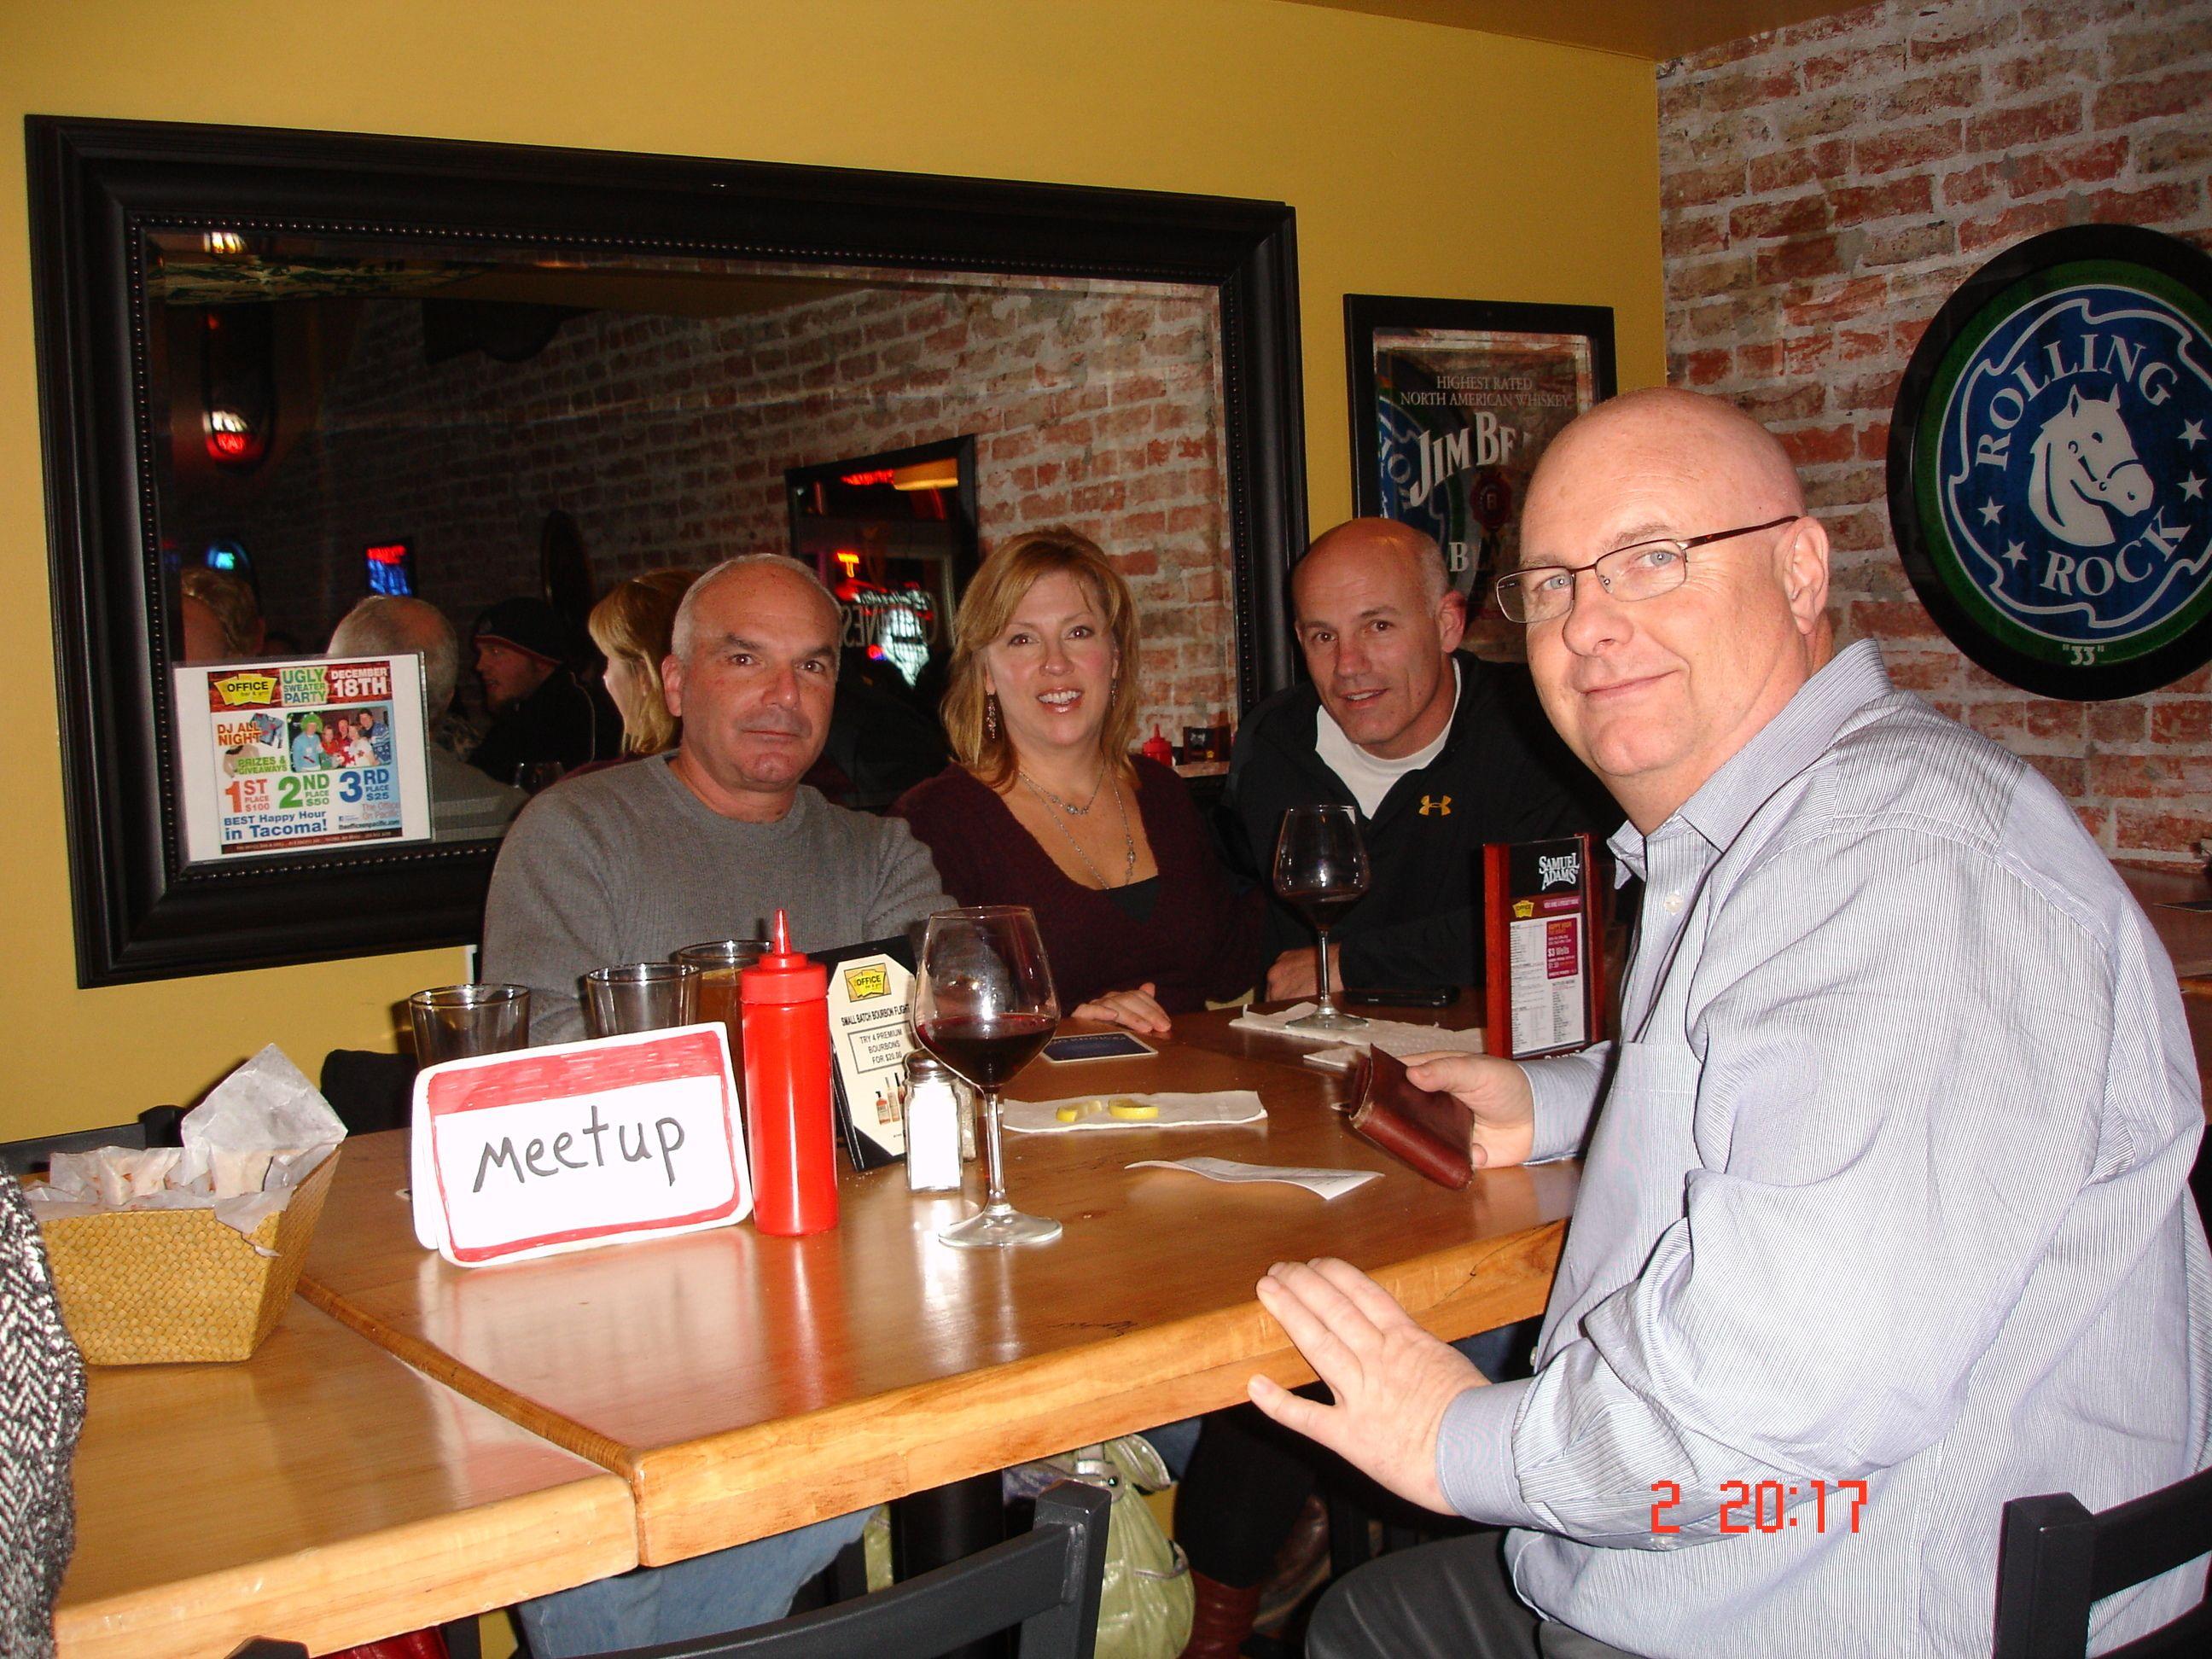 Photos Tacoma Wine Dine And Happy Hour Tacoma Wa Meetup